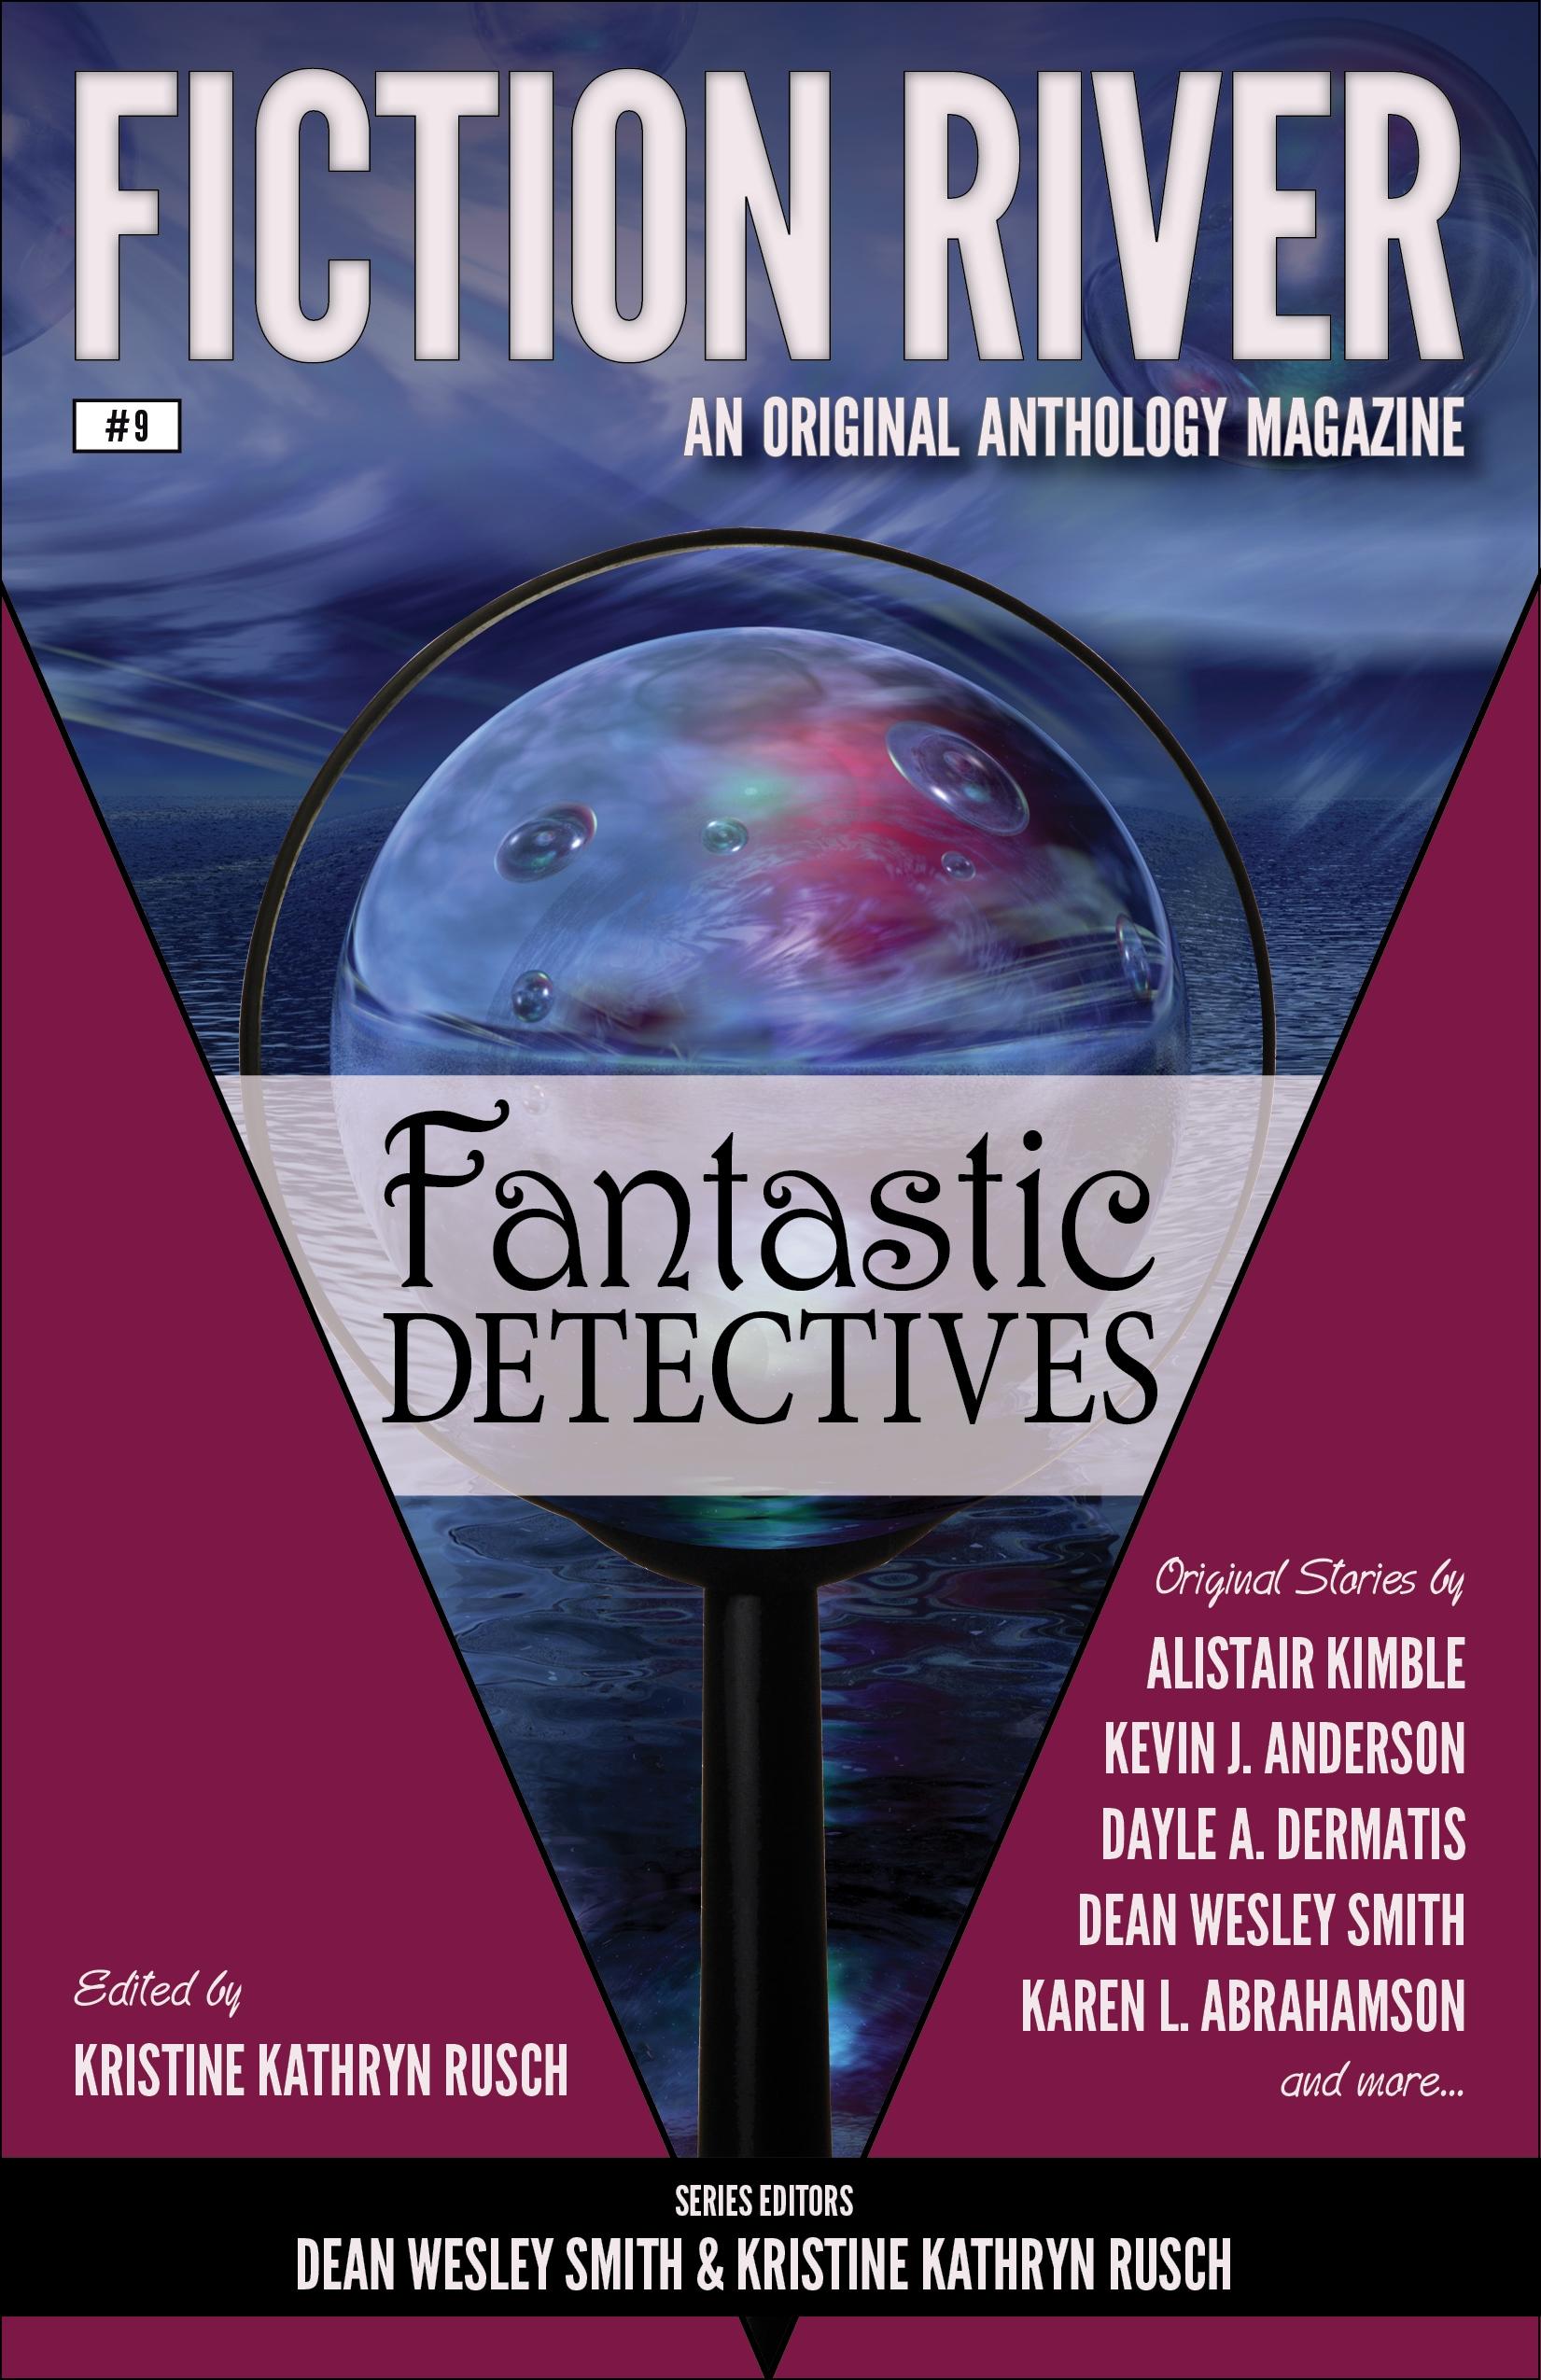 FR Fantastic Detectives ebook cover